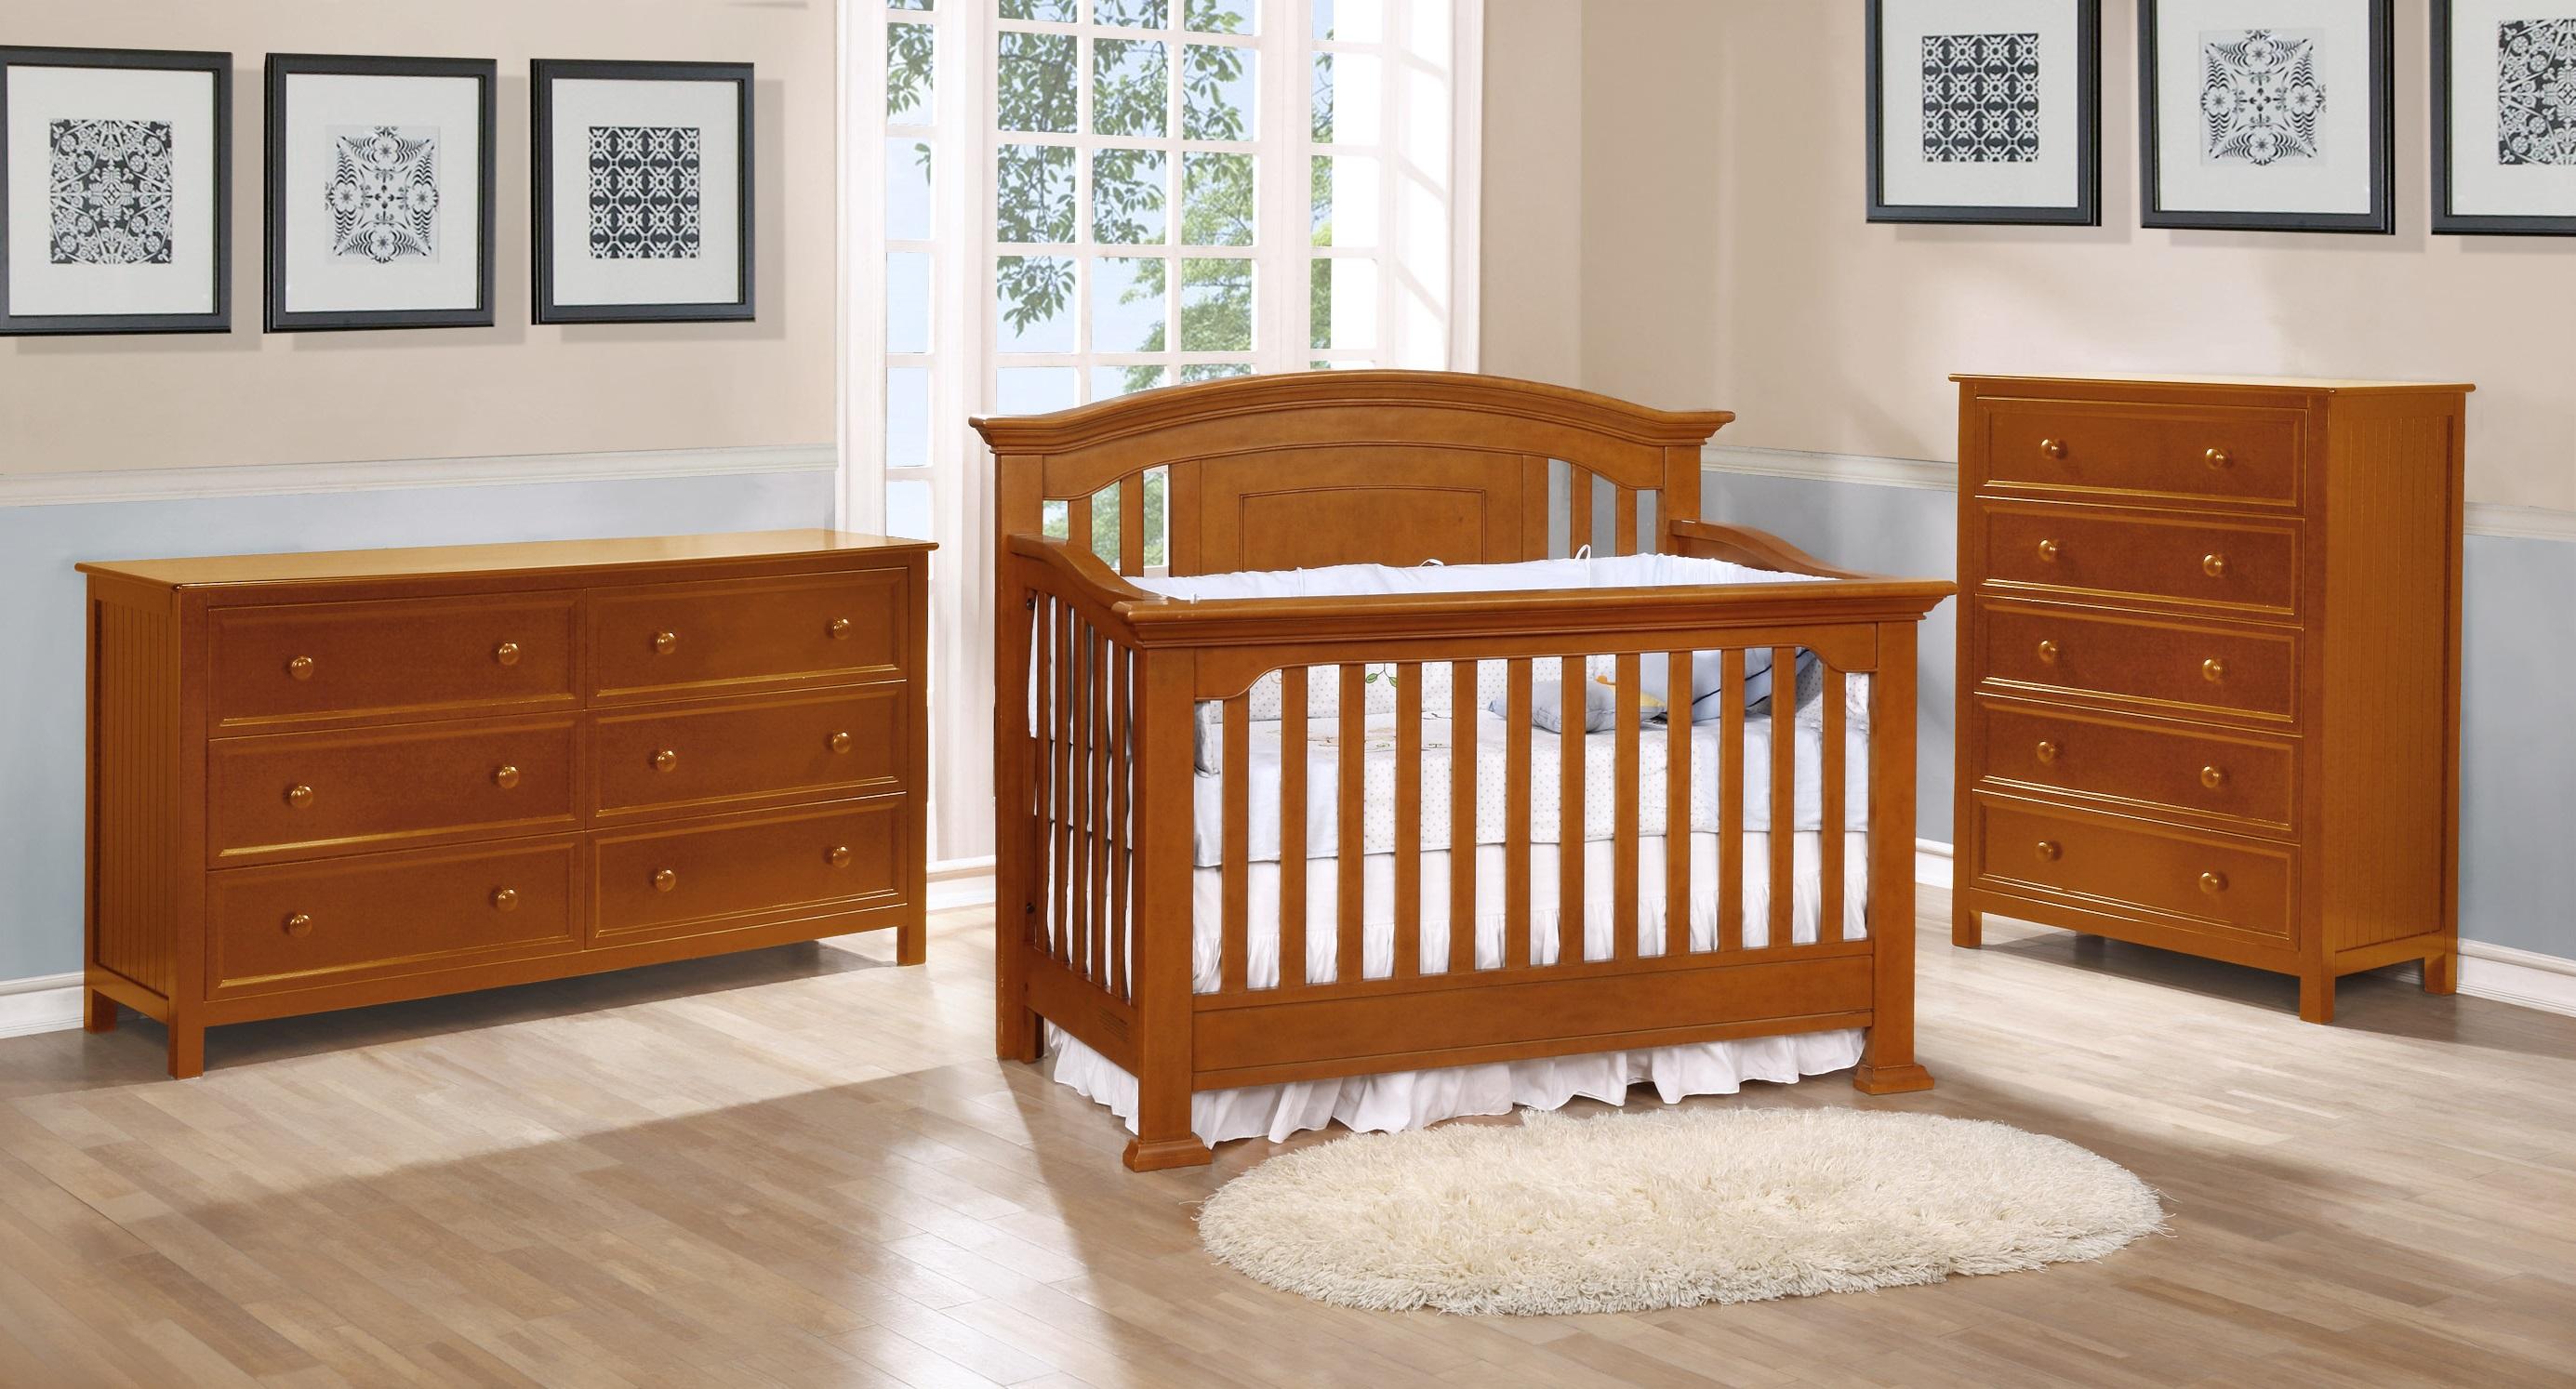 Jordan Conversion Crib with Summerlin Collection Rustic Pecan